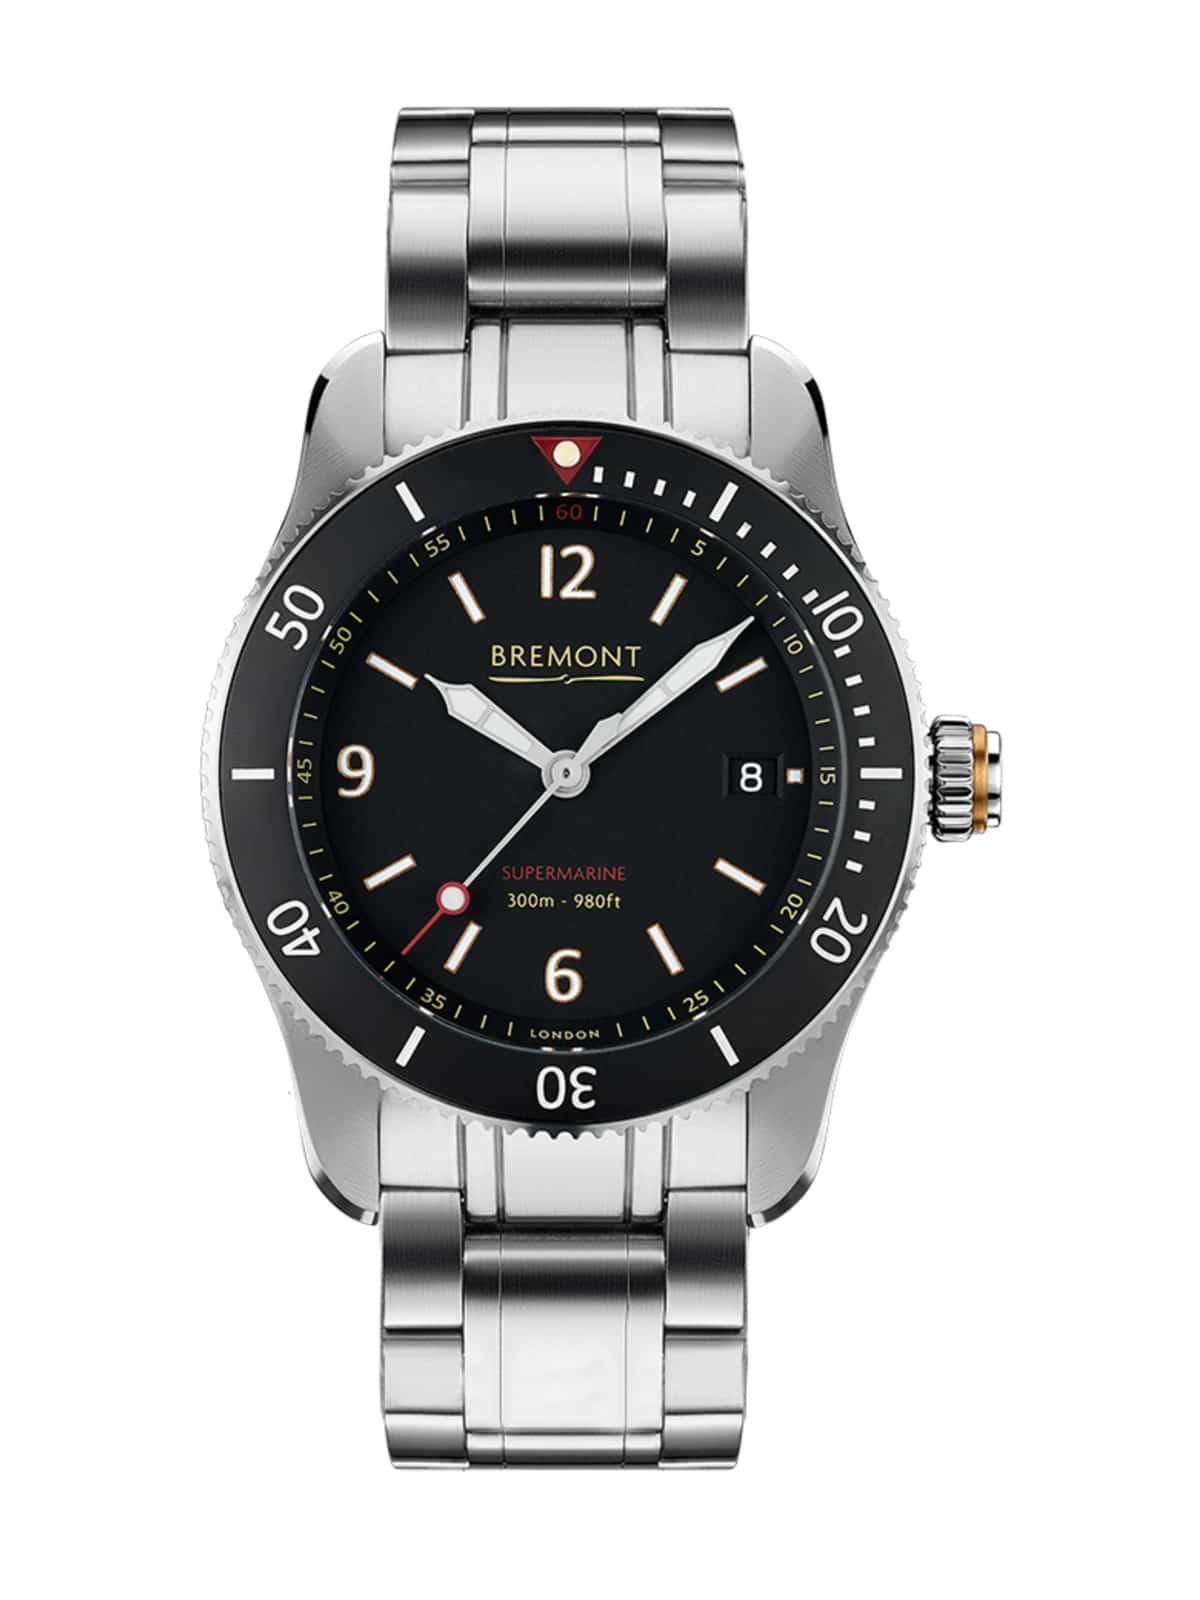 S300 BK BR Watch